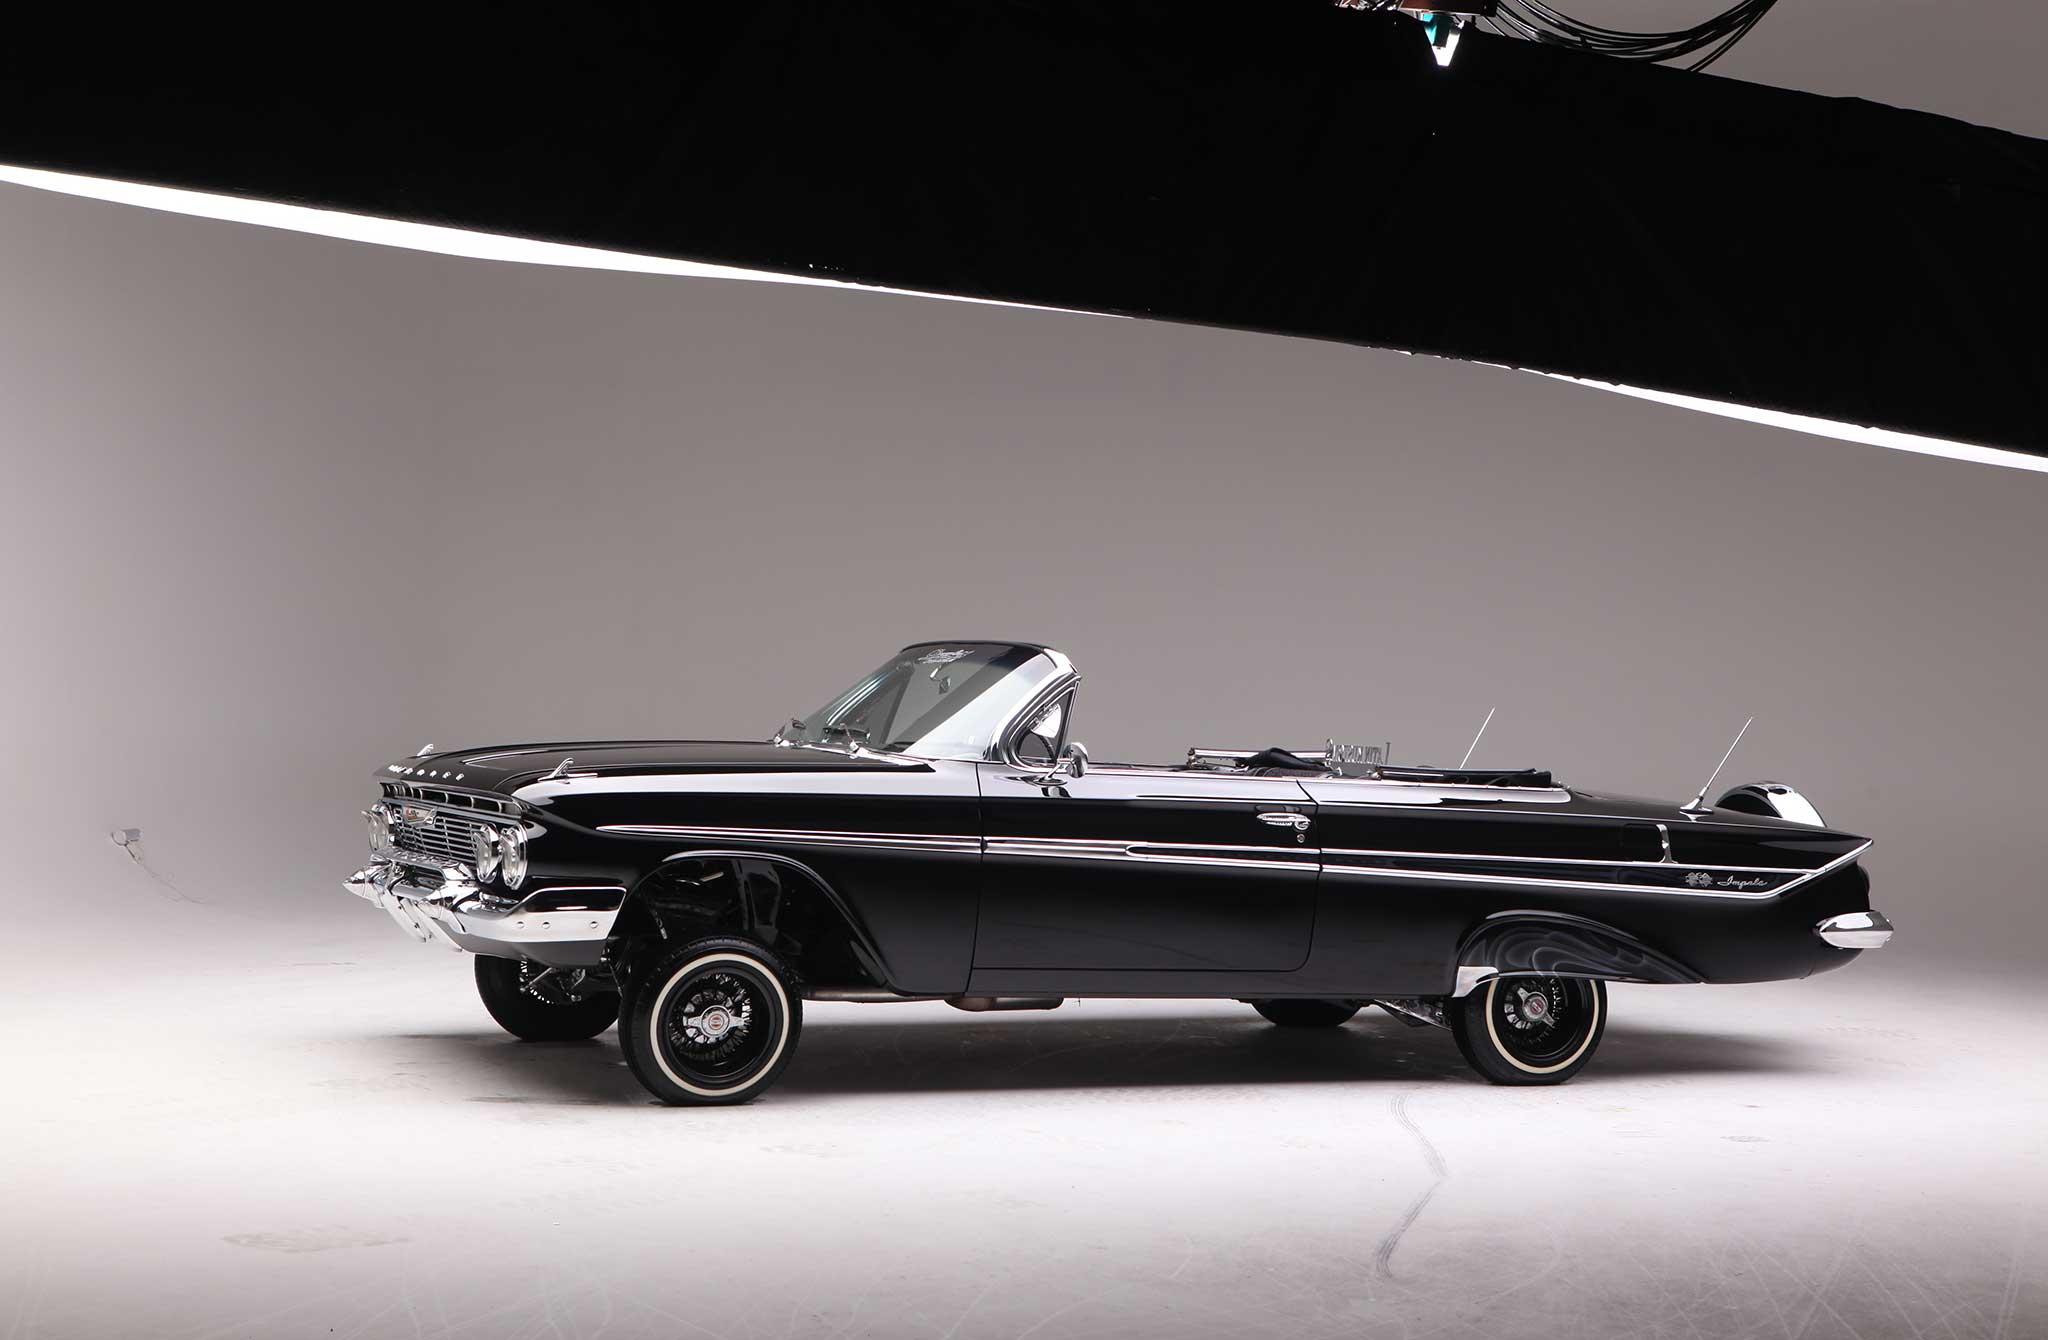 1961 Chevrolet Impala SS Convertible  The KISS Principle